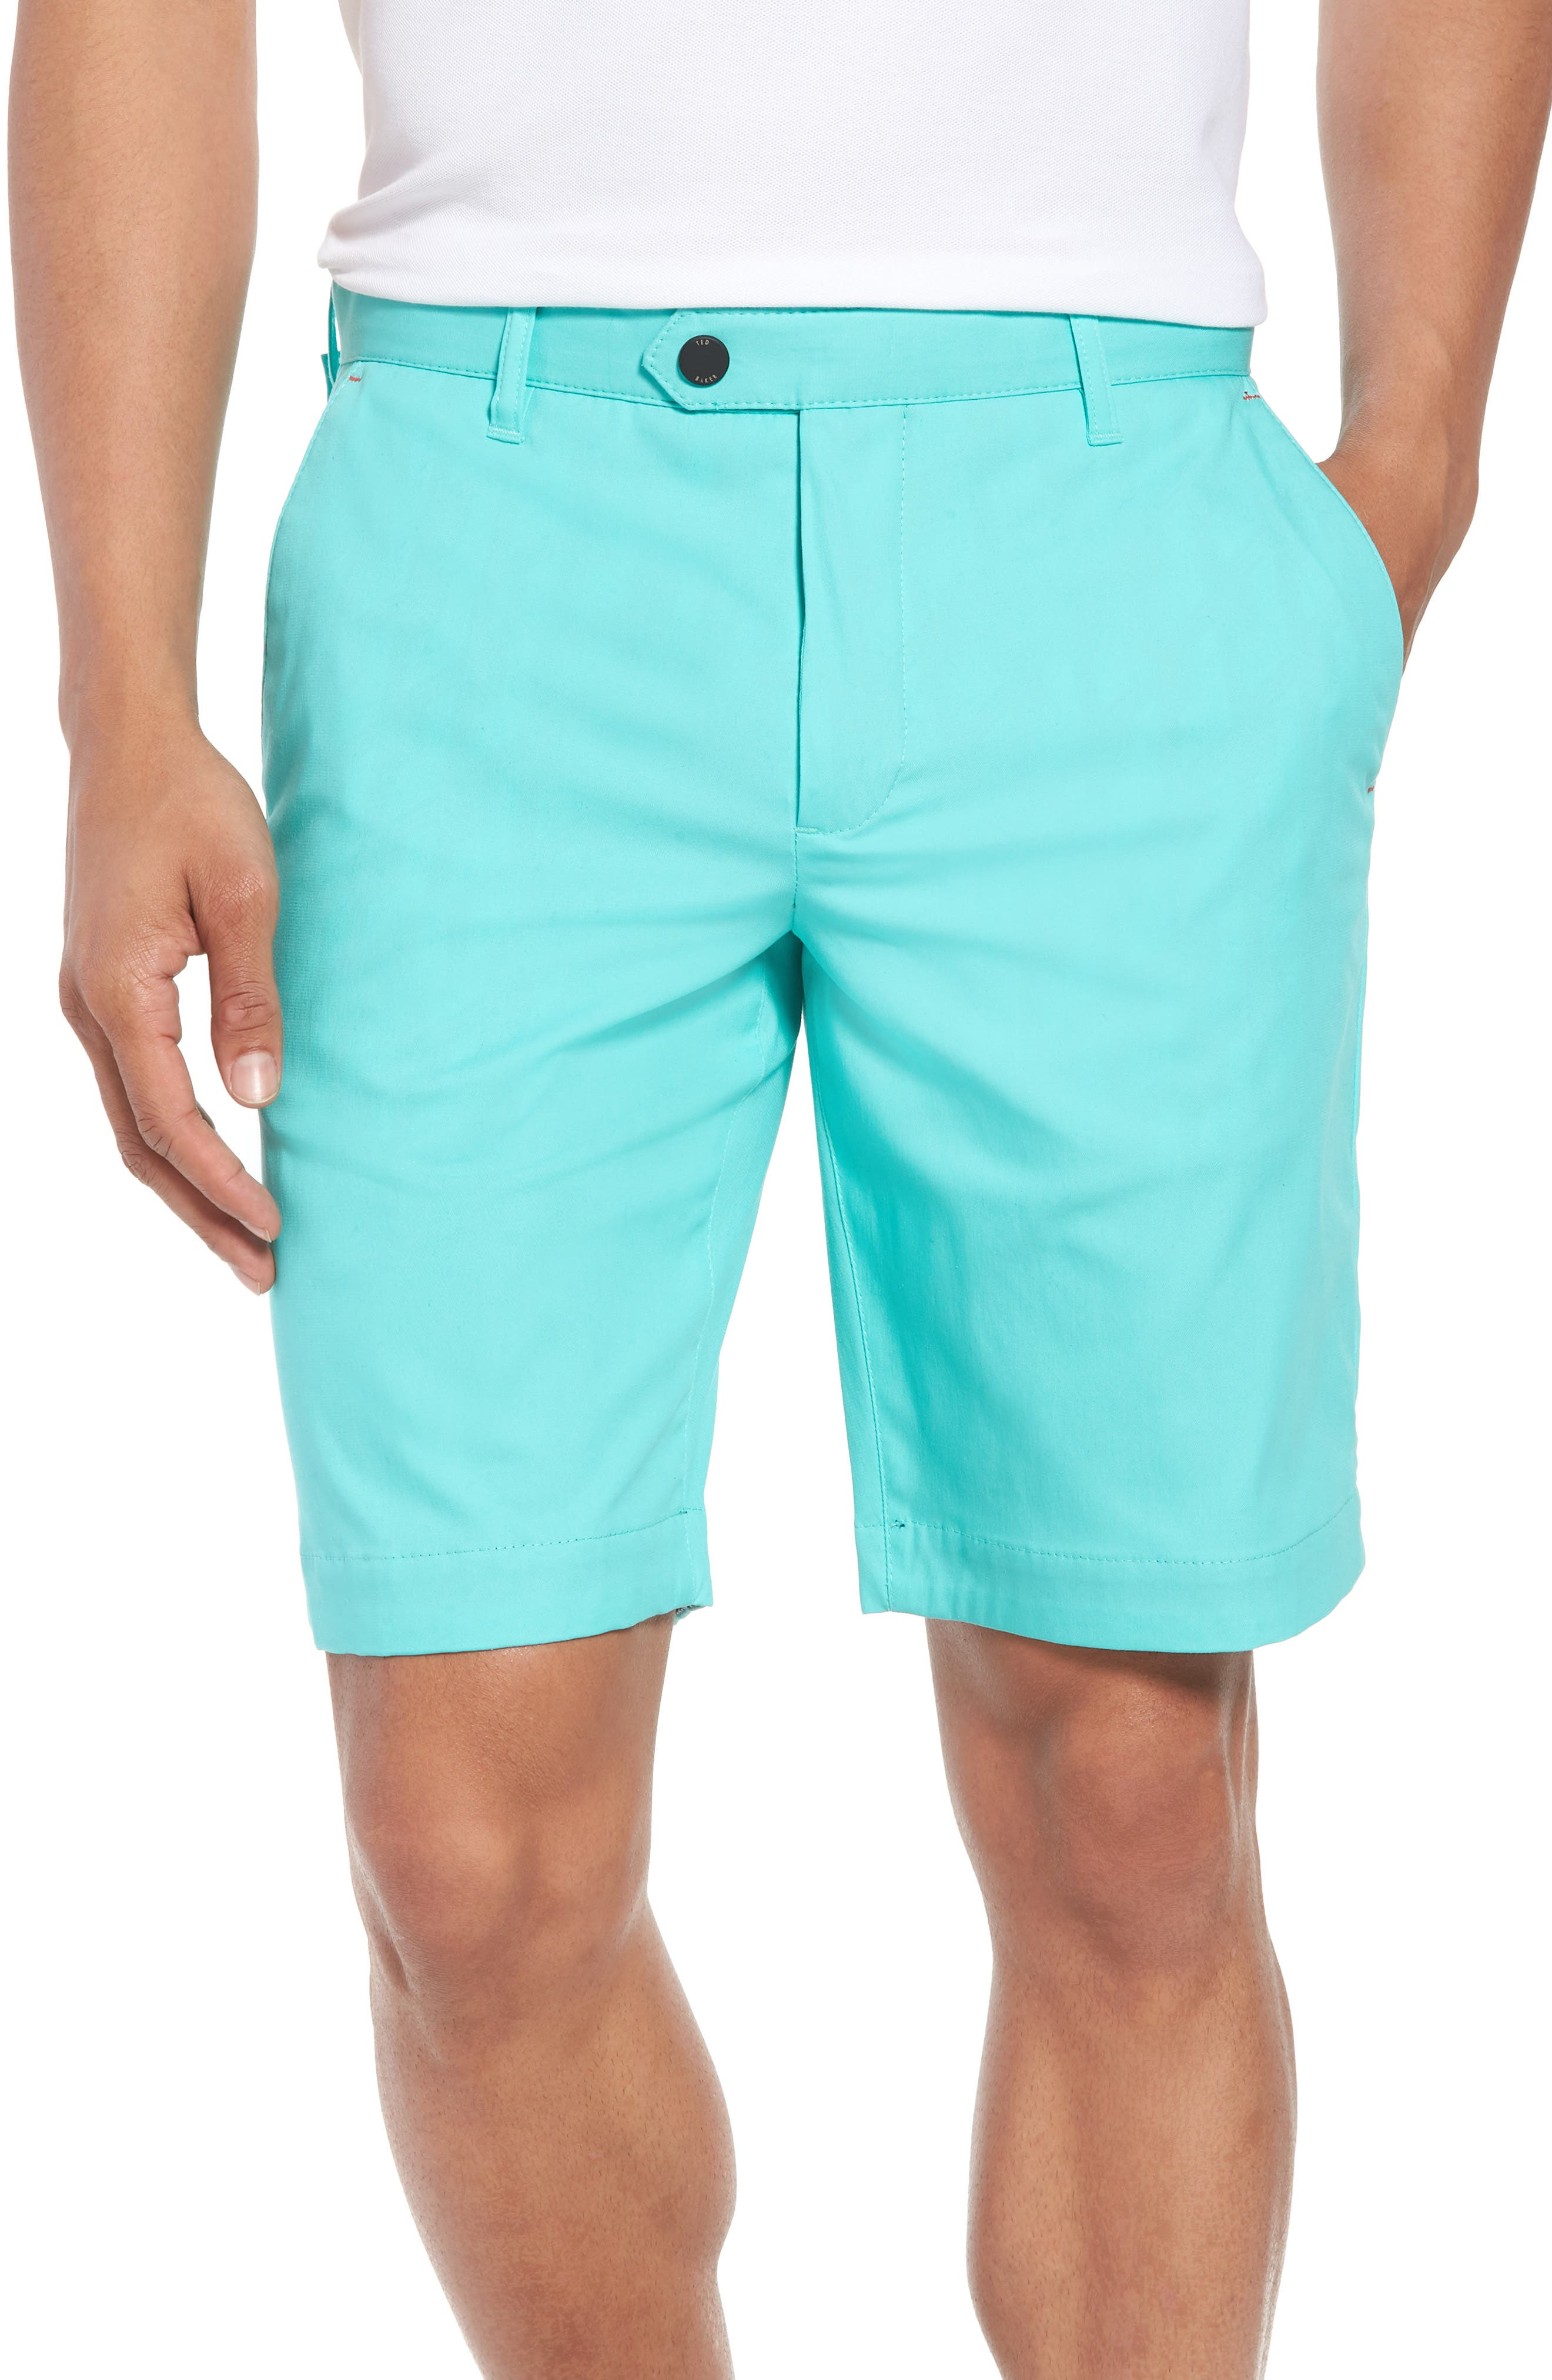 Twopar Flat Front Shorts,                             Main thumbnail 1, color,                             GREEN